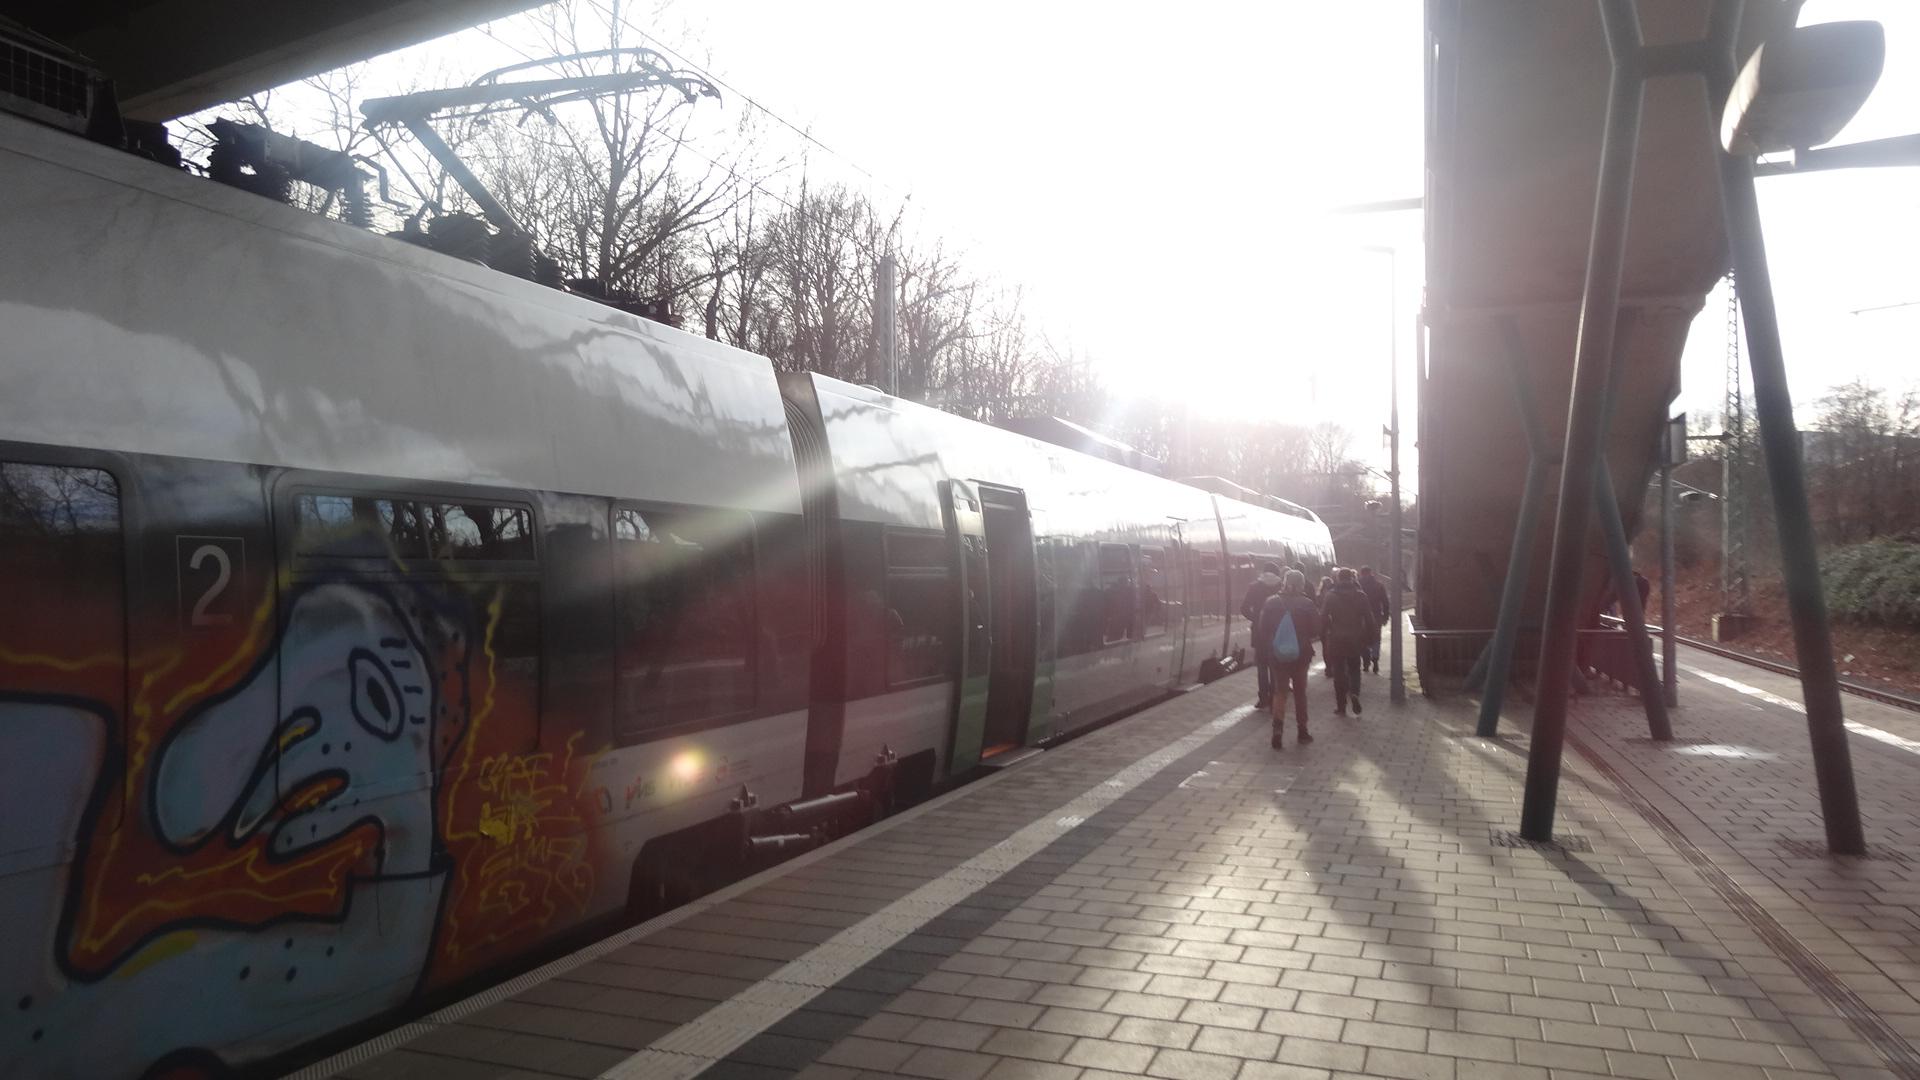 Leipzig Völkerschlachtdenkmal station